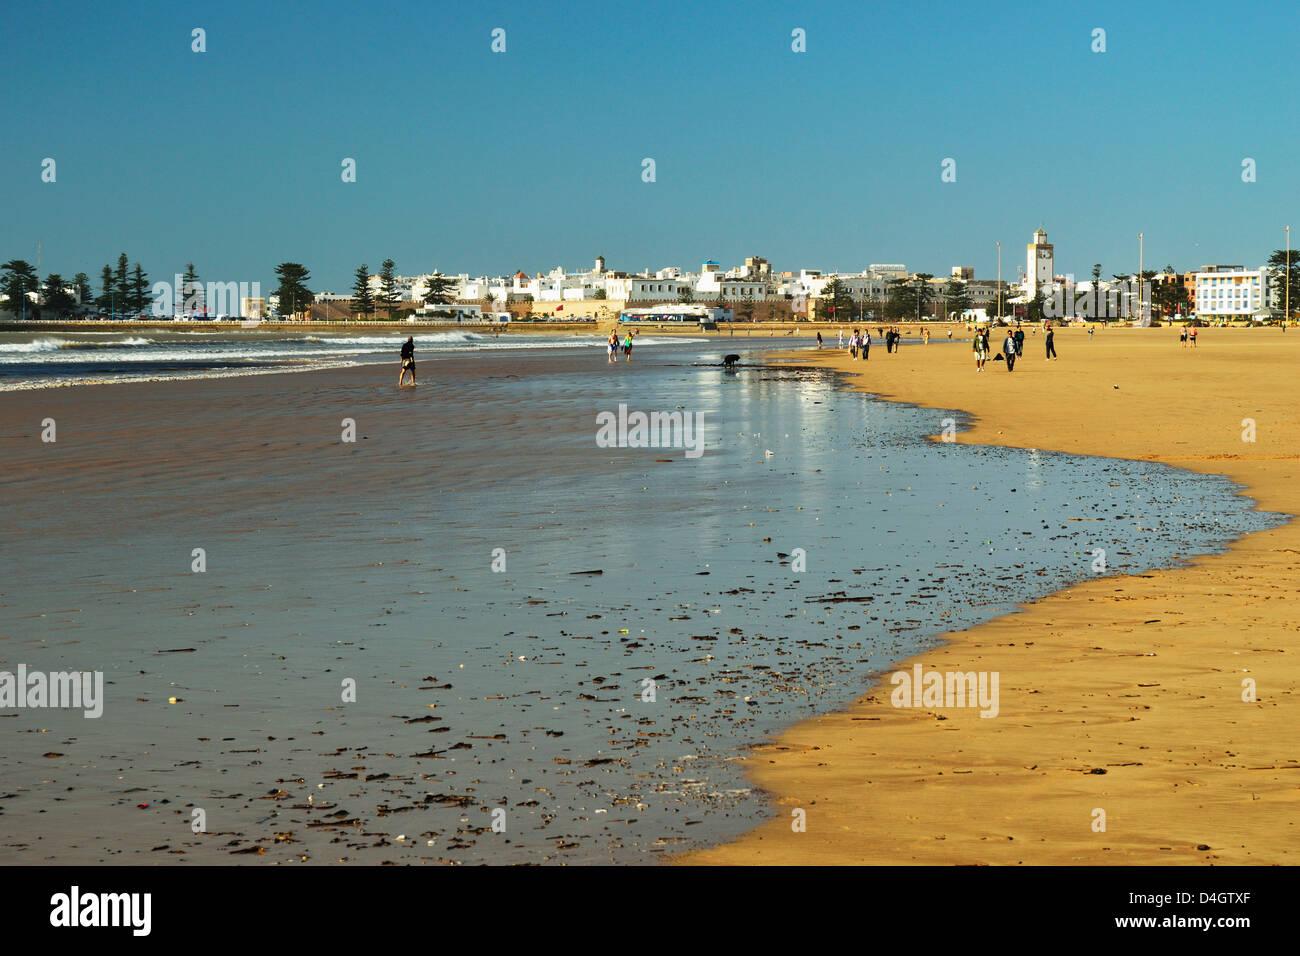 View of Essaouira, Atlantic Coast, Morocco, North Africa - Stock Image